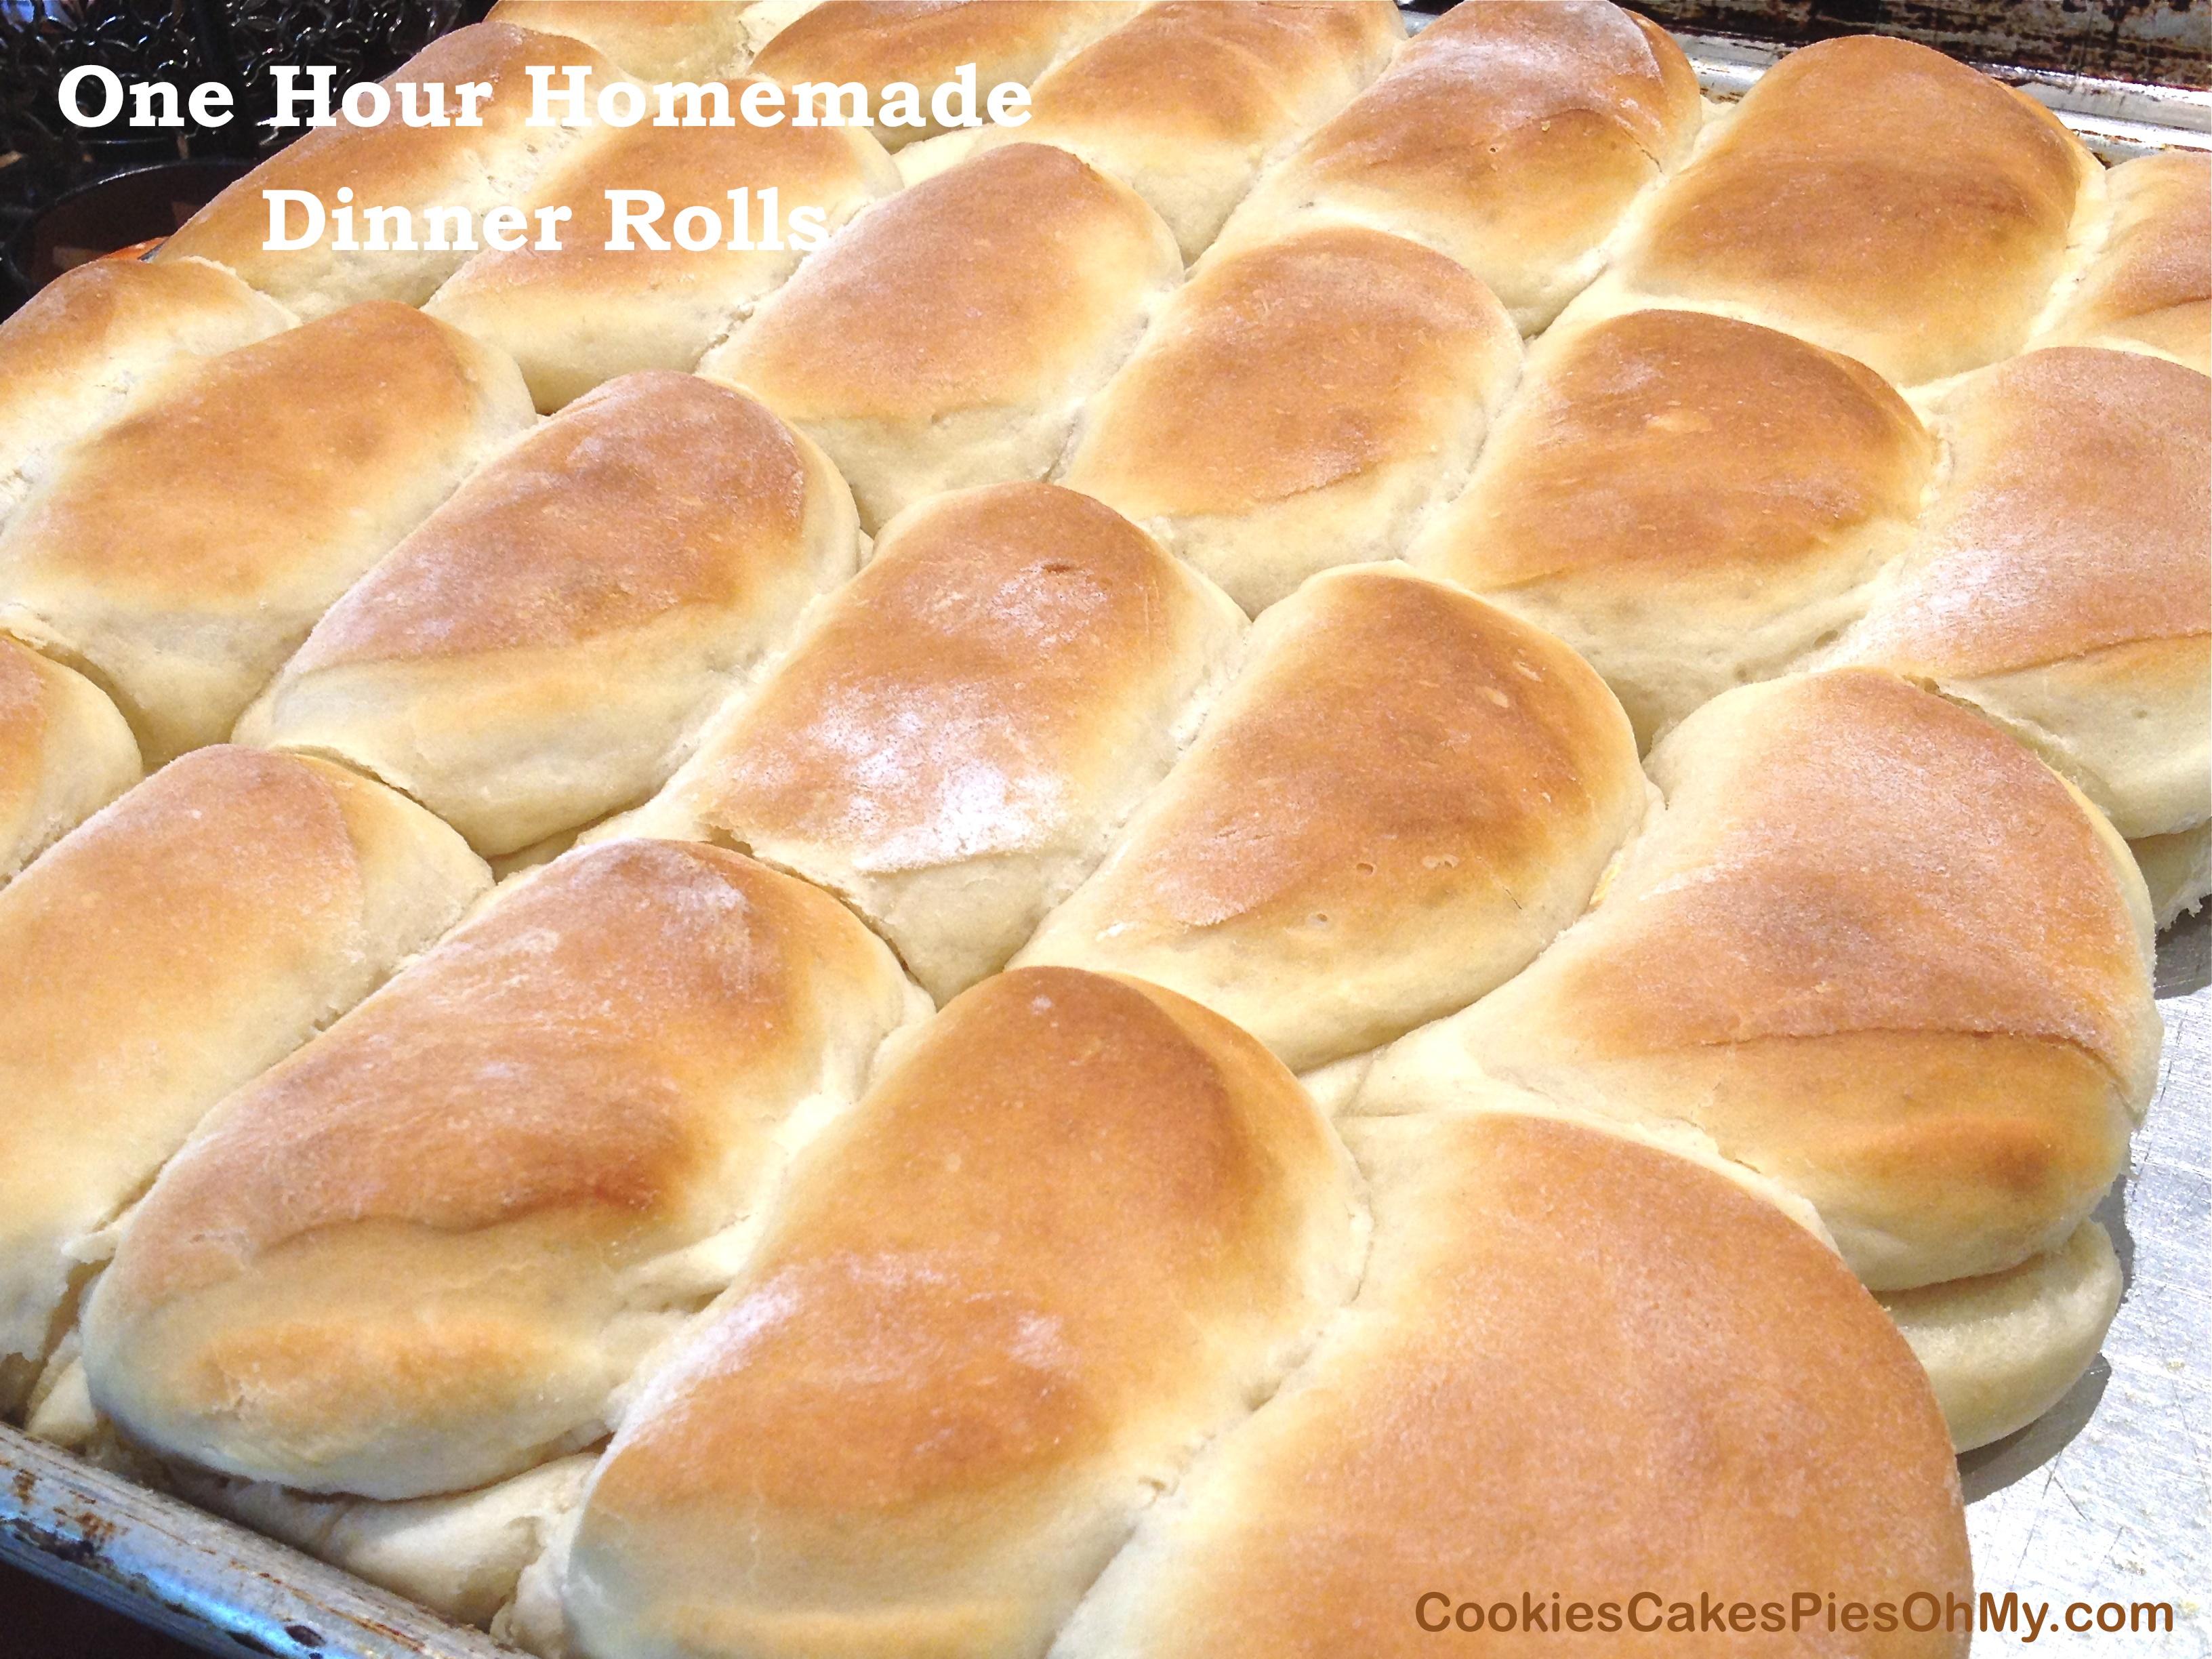 One Hour Homemade Dinner Rolls | CookiesCakesPiesOhMy